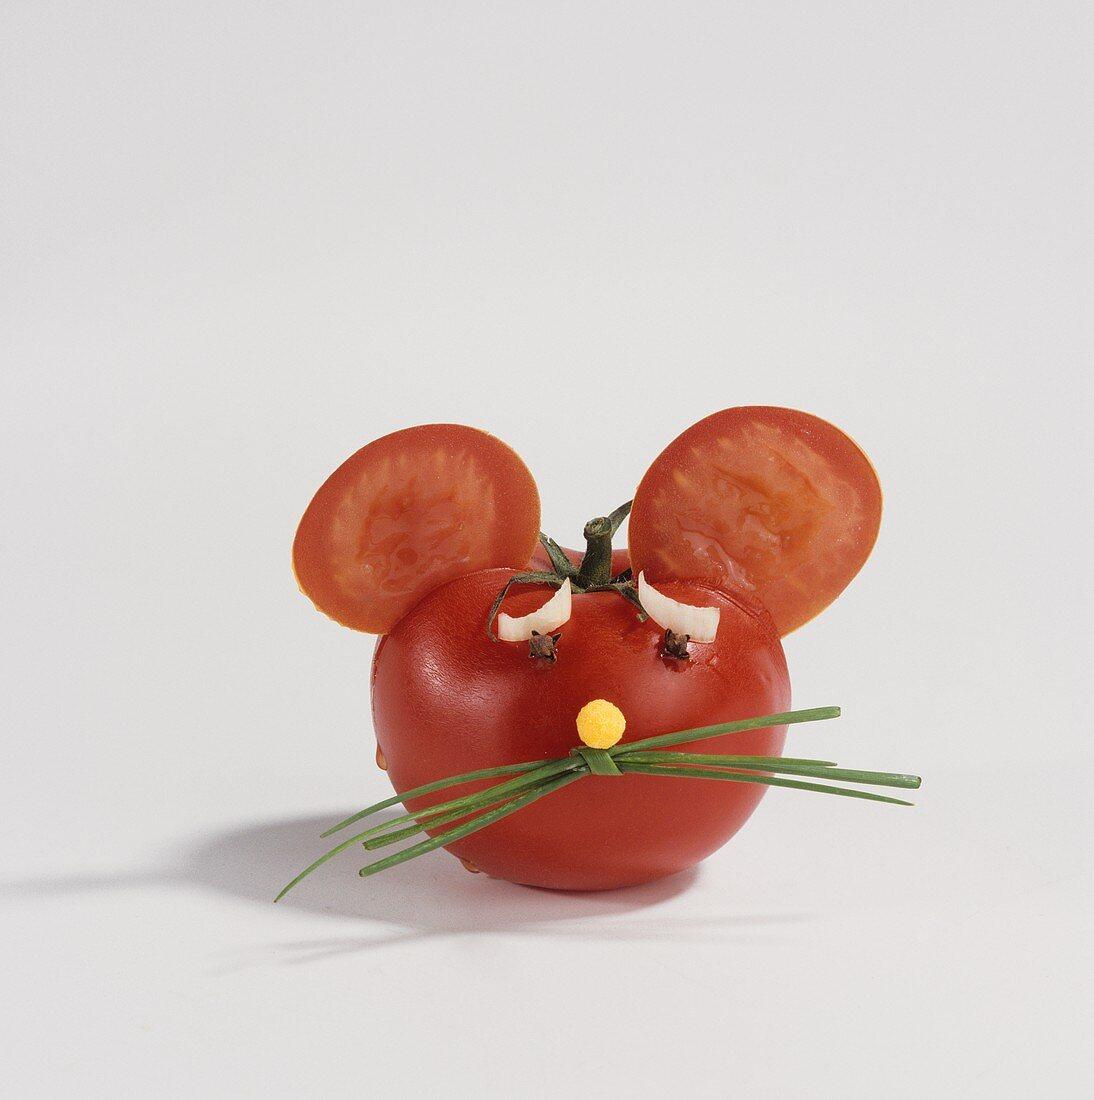 Tomato mouse